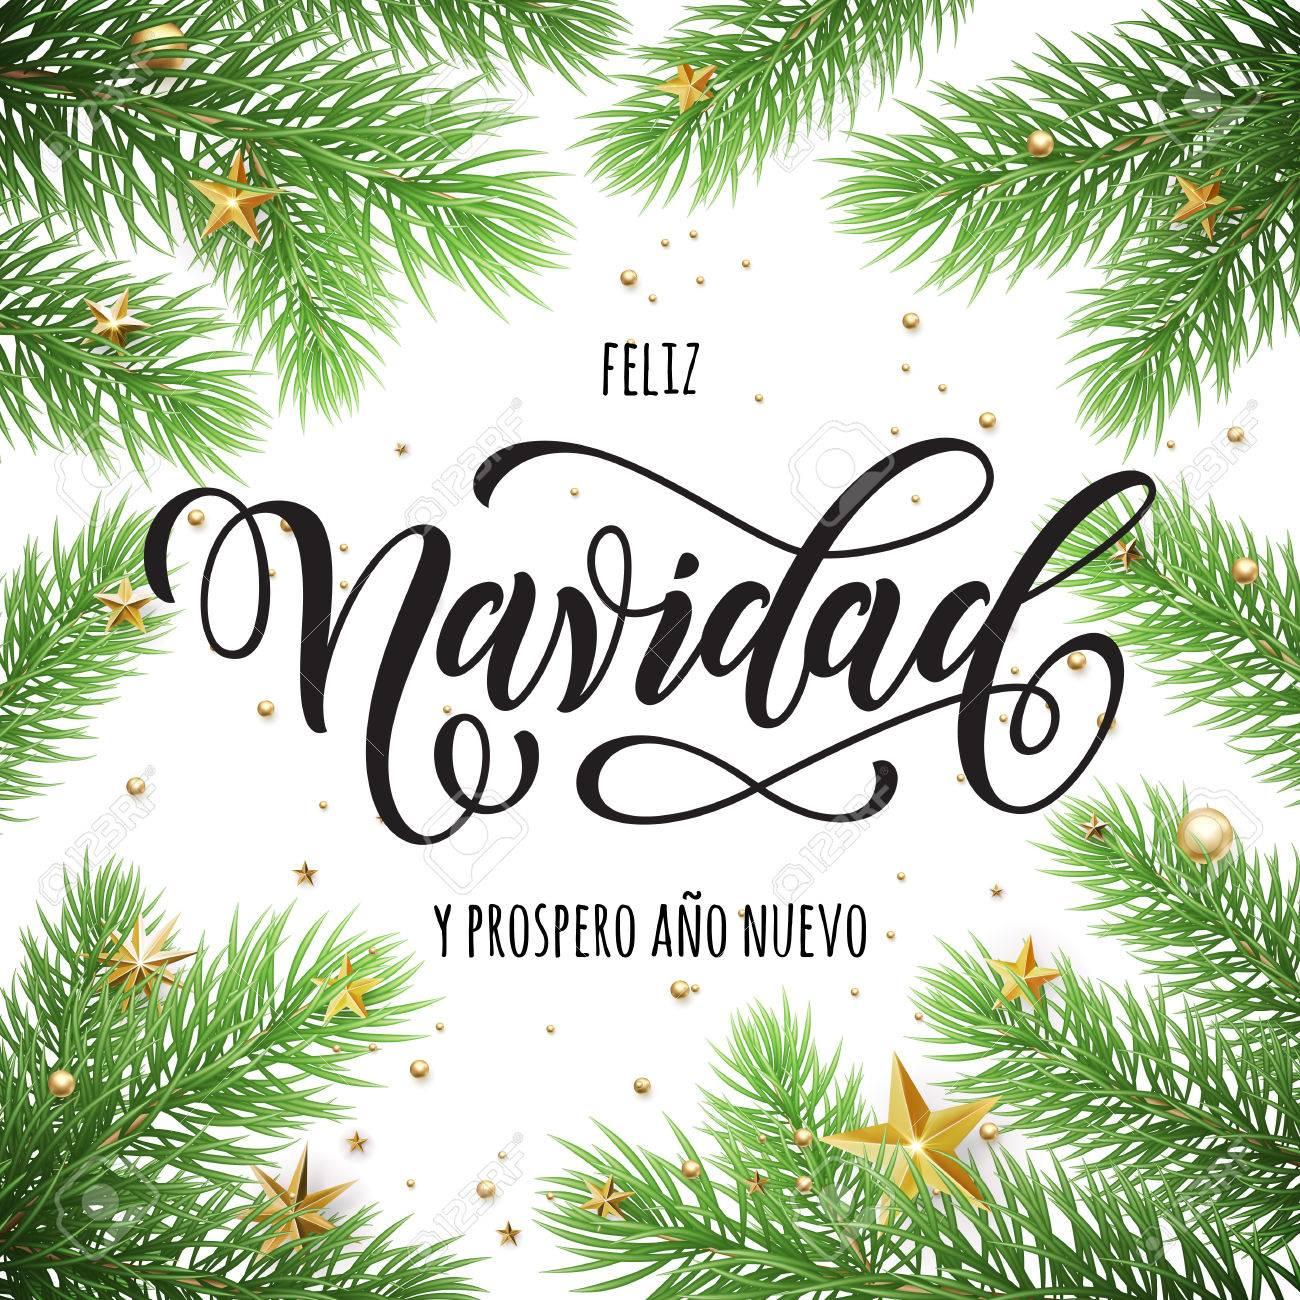 Feliz Navidad Joyeux Noel 2019.Feliz Navidad Et Prospero Ano Nuevo Espagnol Joyeux Noel Et Bonne Annee Dans Le Cadre De Branches D Arbres Carte De Voeux De Noel Festive Avec